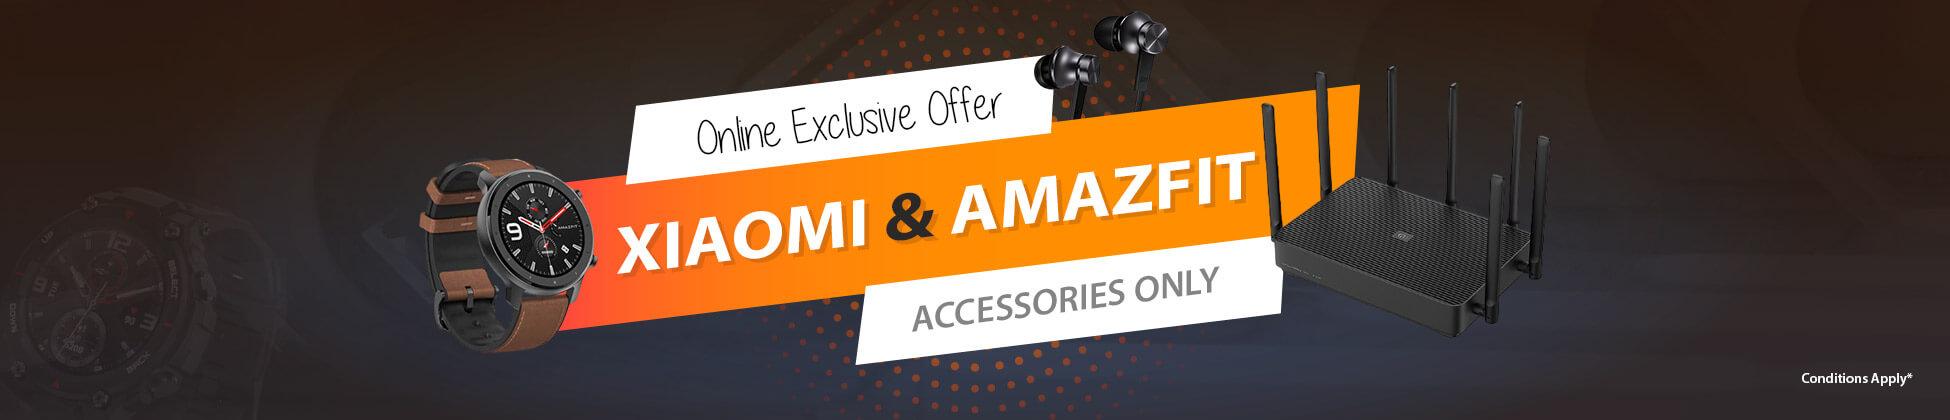 Xiaomi & Amazfit Exclusive Offer